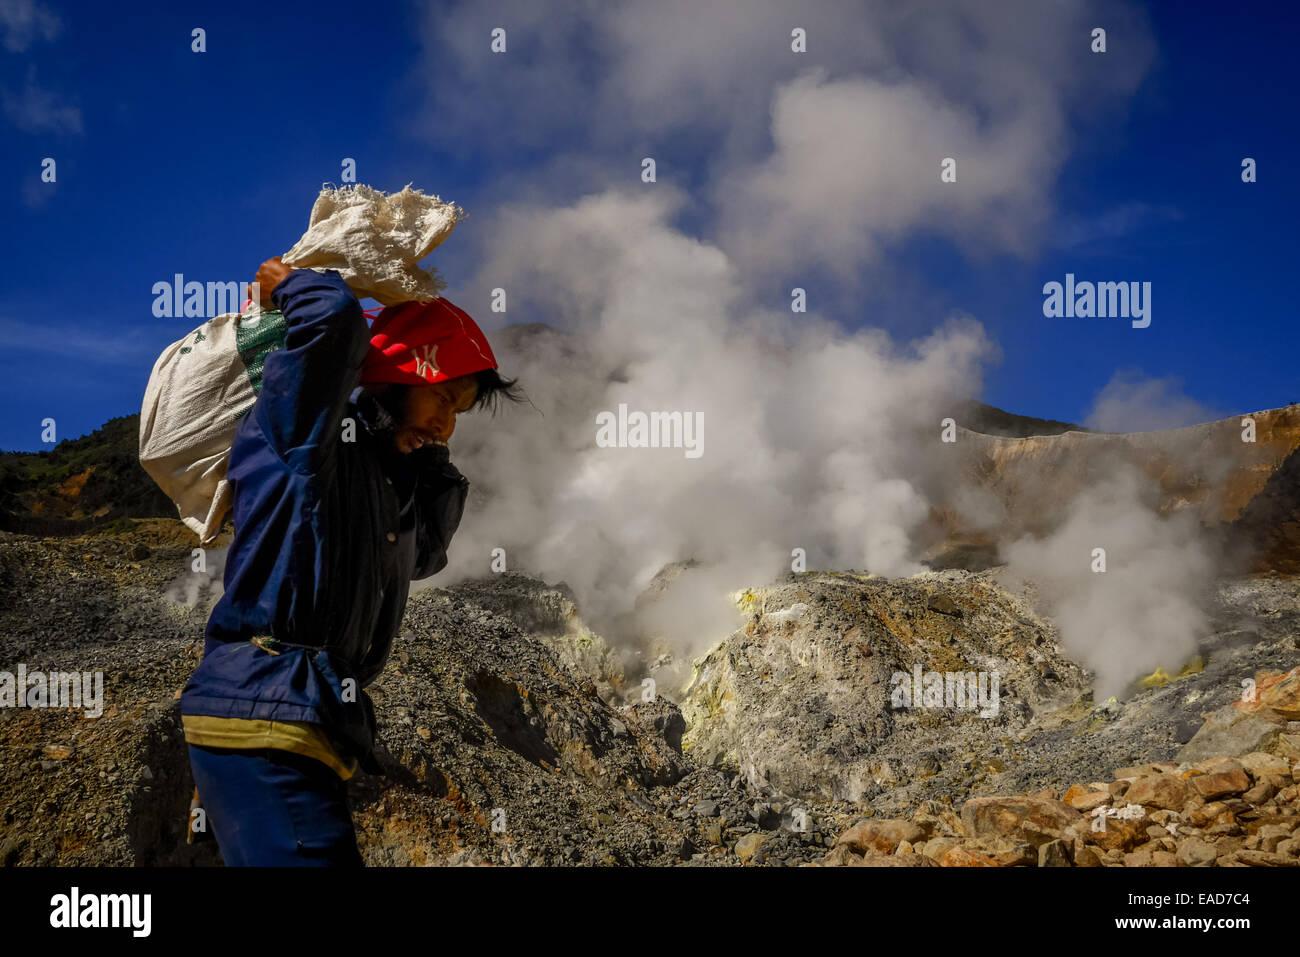 Man passes through crater ridge of Mount Papandayan, West Java, Indonesia. © Reynold Sumayku - Stock Image